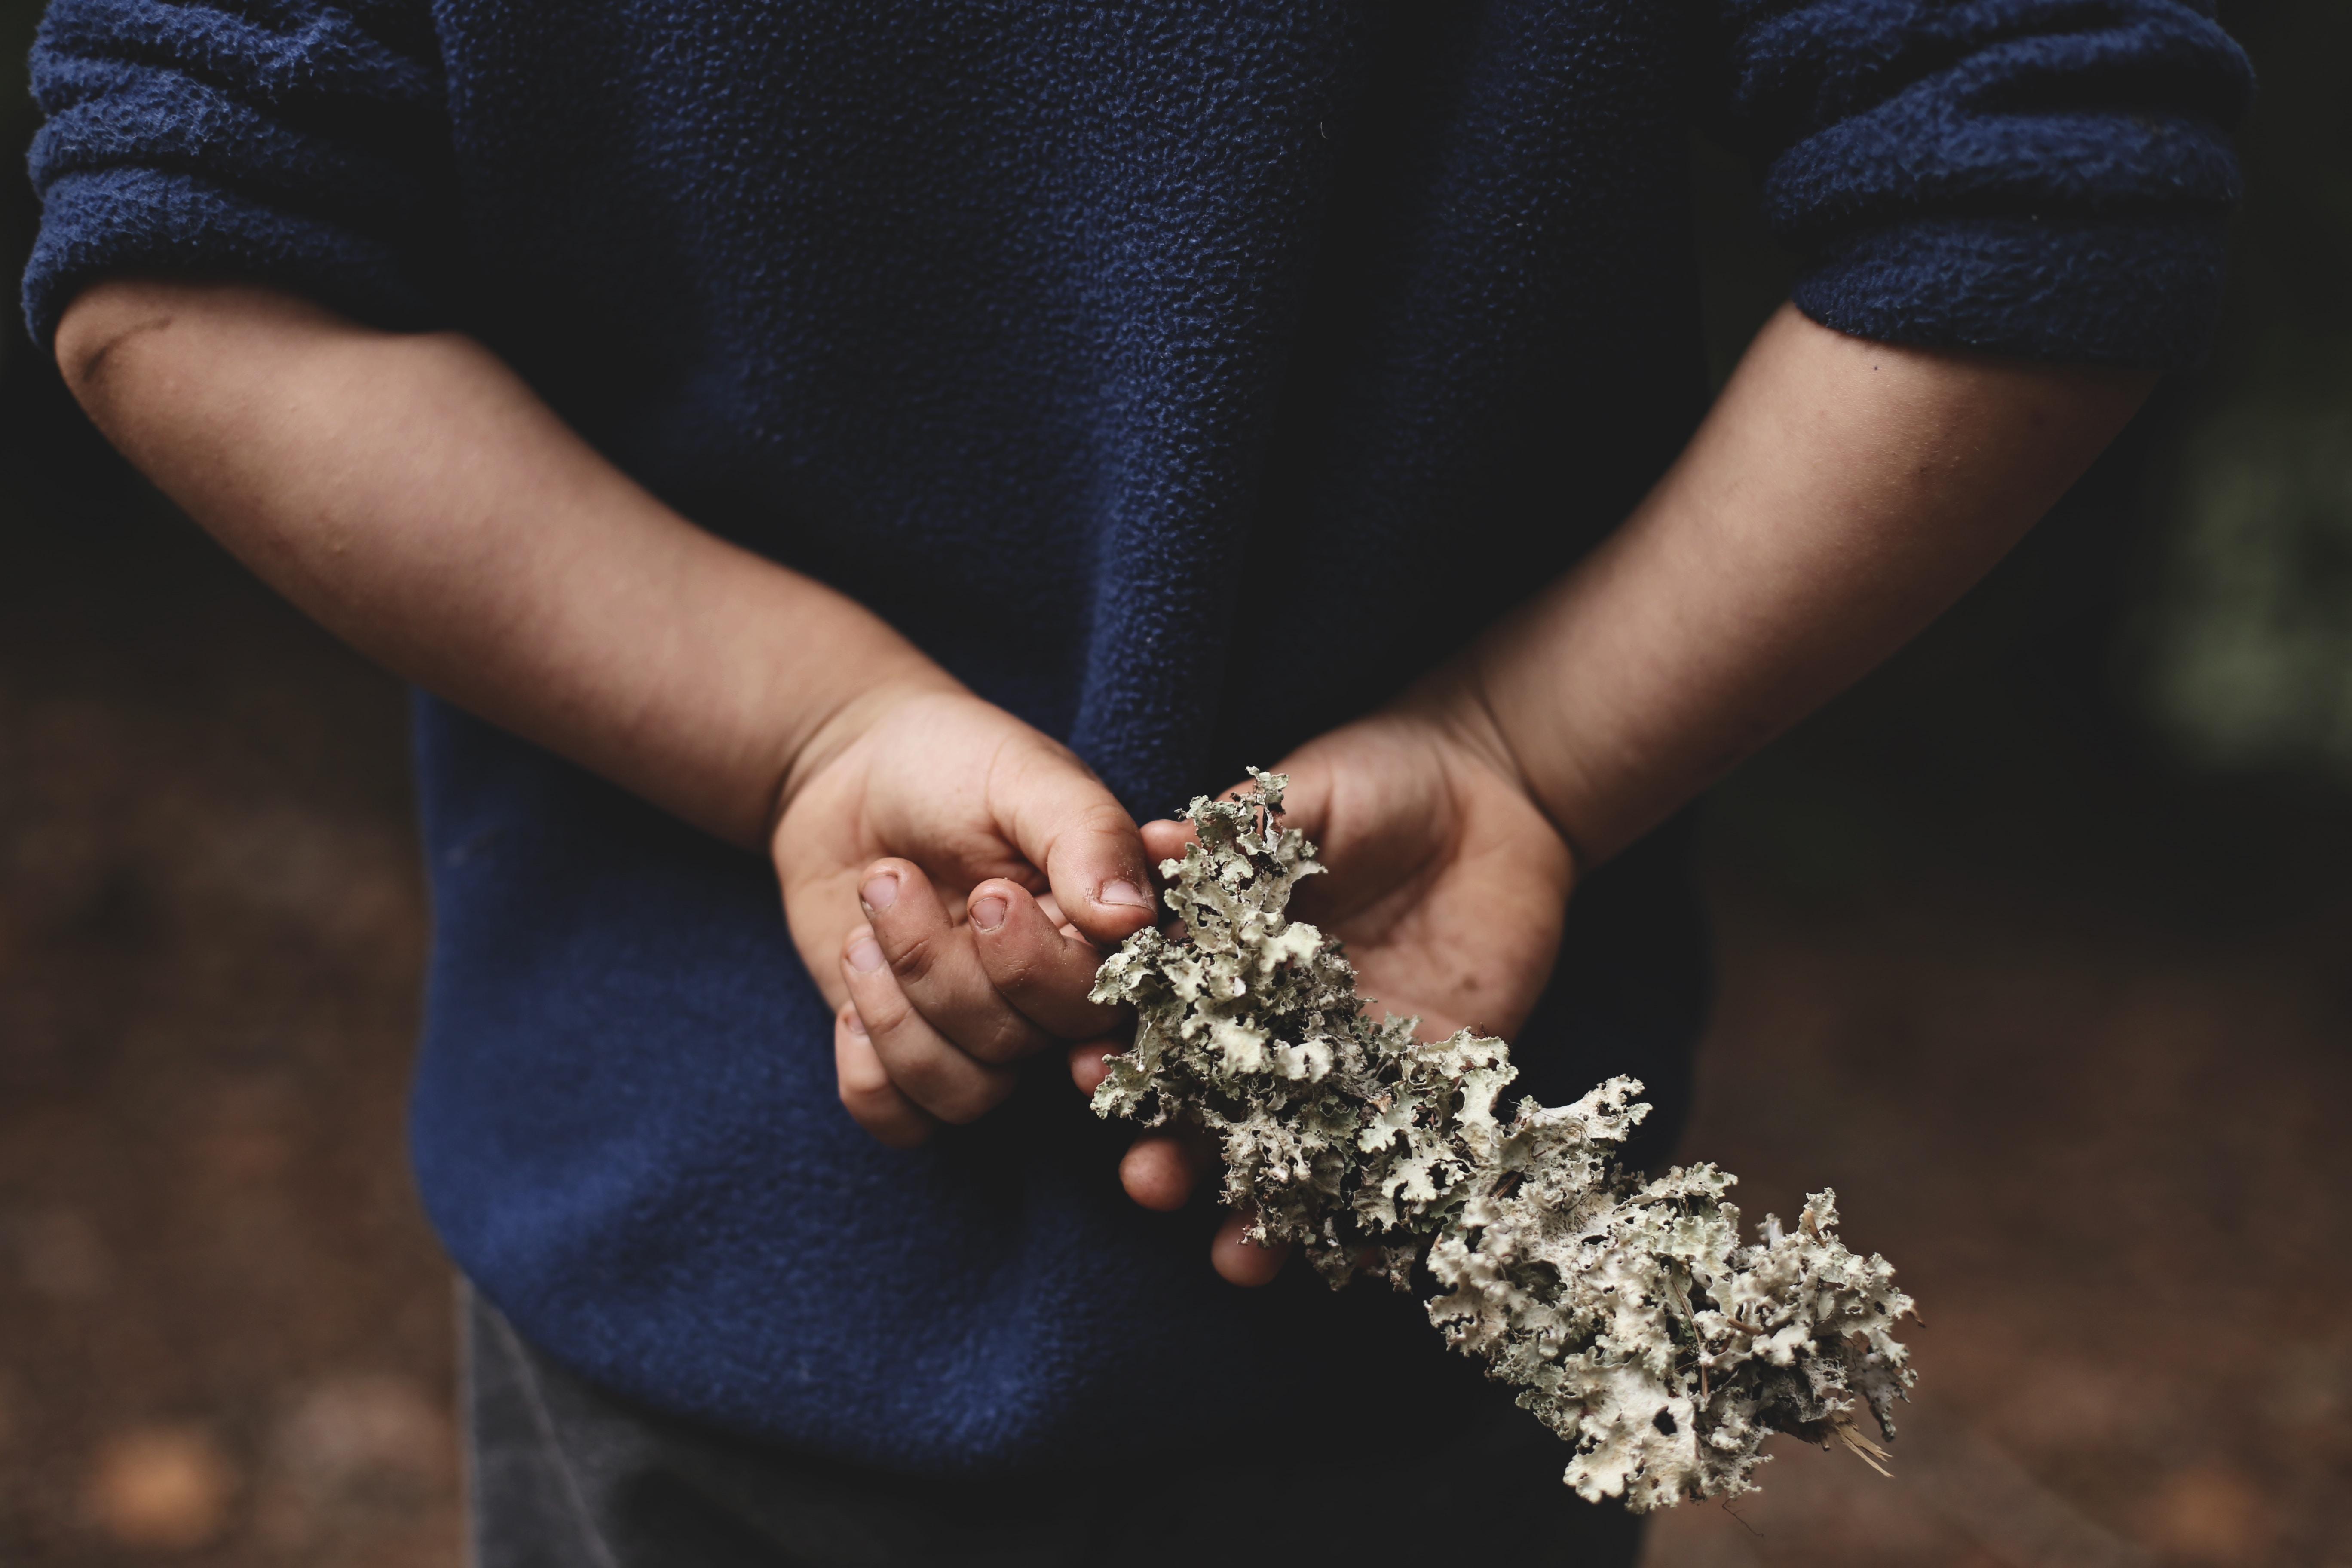 person holding white stone